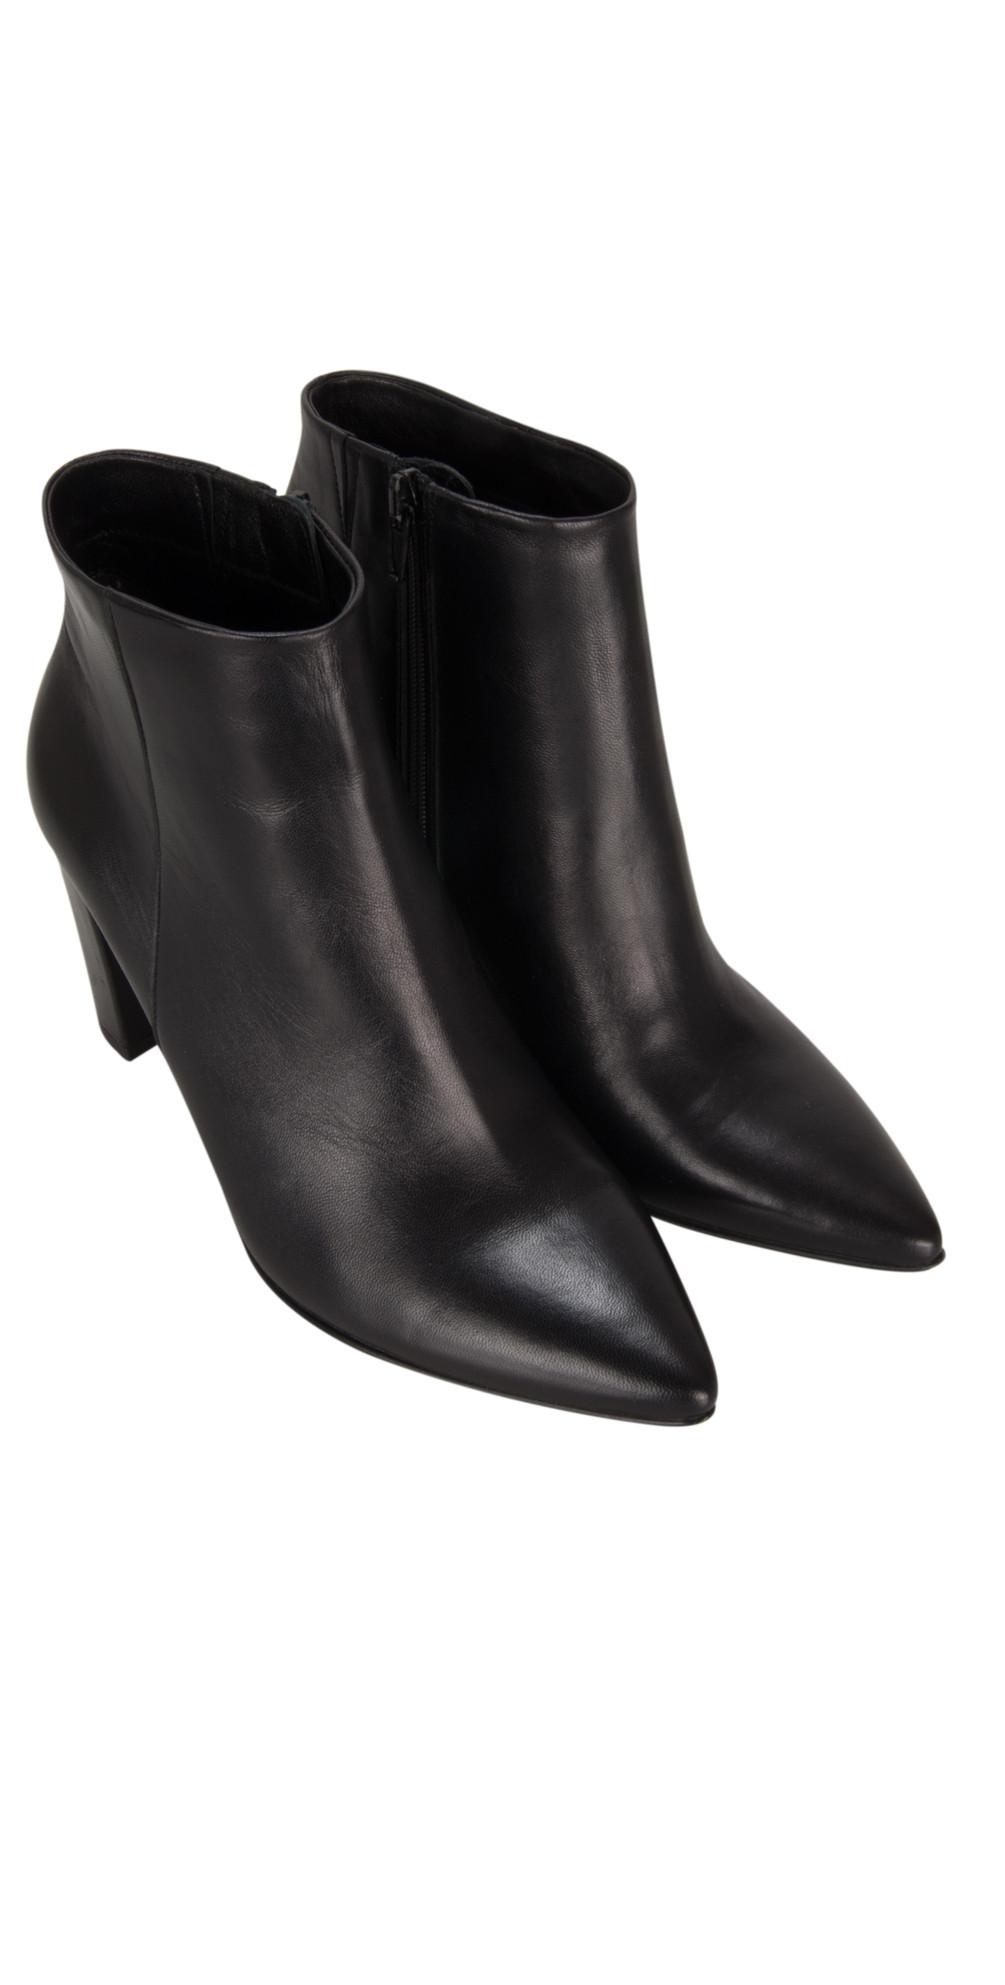 kennel und schmenger uma nappa ankle boot in schwarz. Black Bedroom Furniture Sets. Home Design Ideas